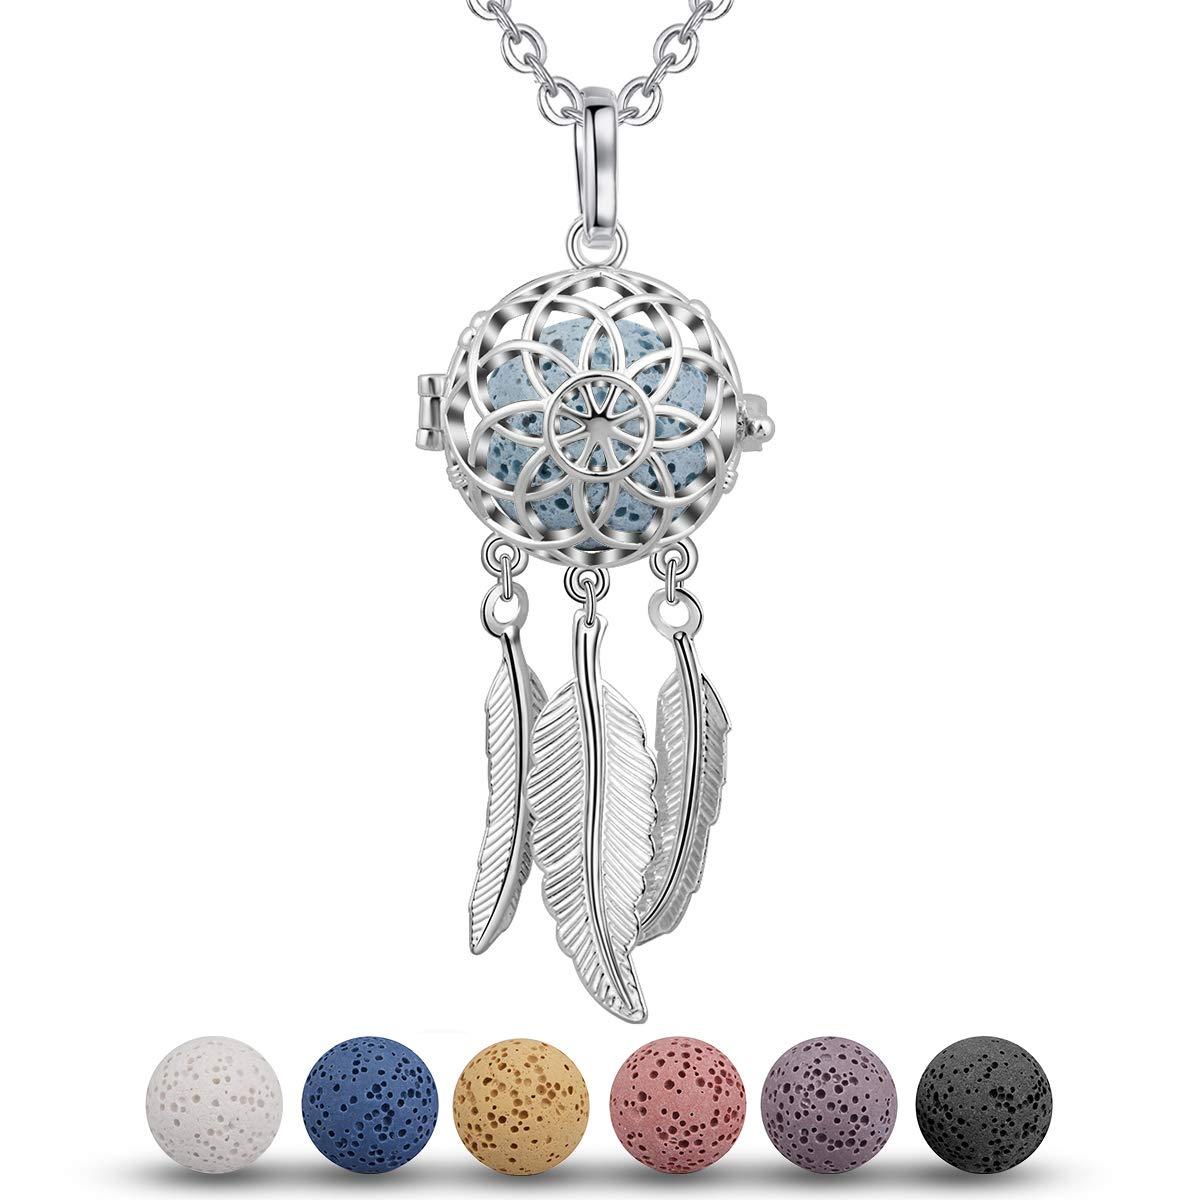 Custom Lava Rock Wire Diffuser Tassel Necklace Aromatherapy Essential Oil oils Jewelry Lotus Yellow Tassels Long Chain Artisan Boho Bohemian